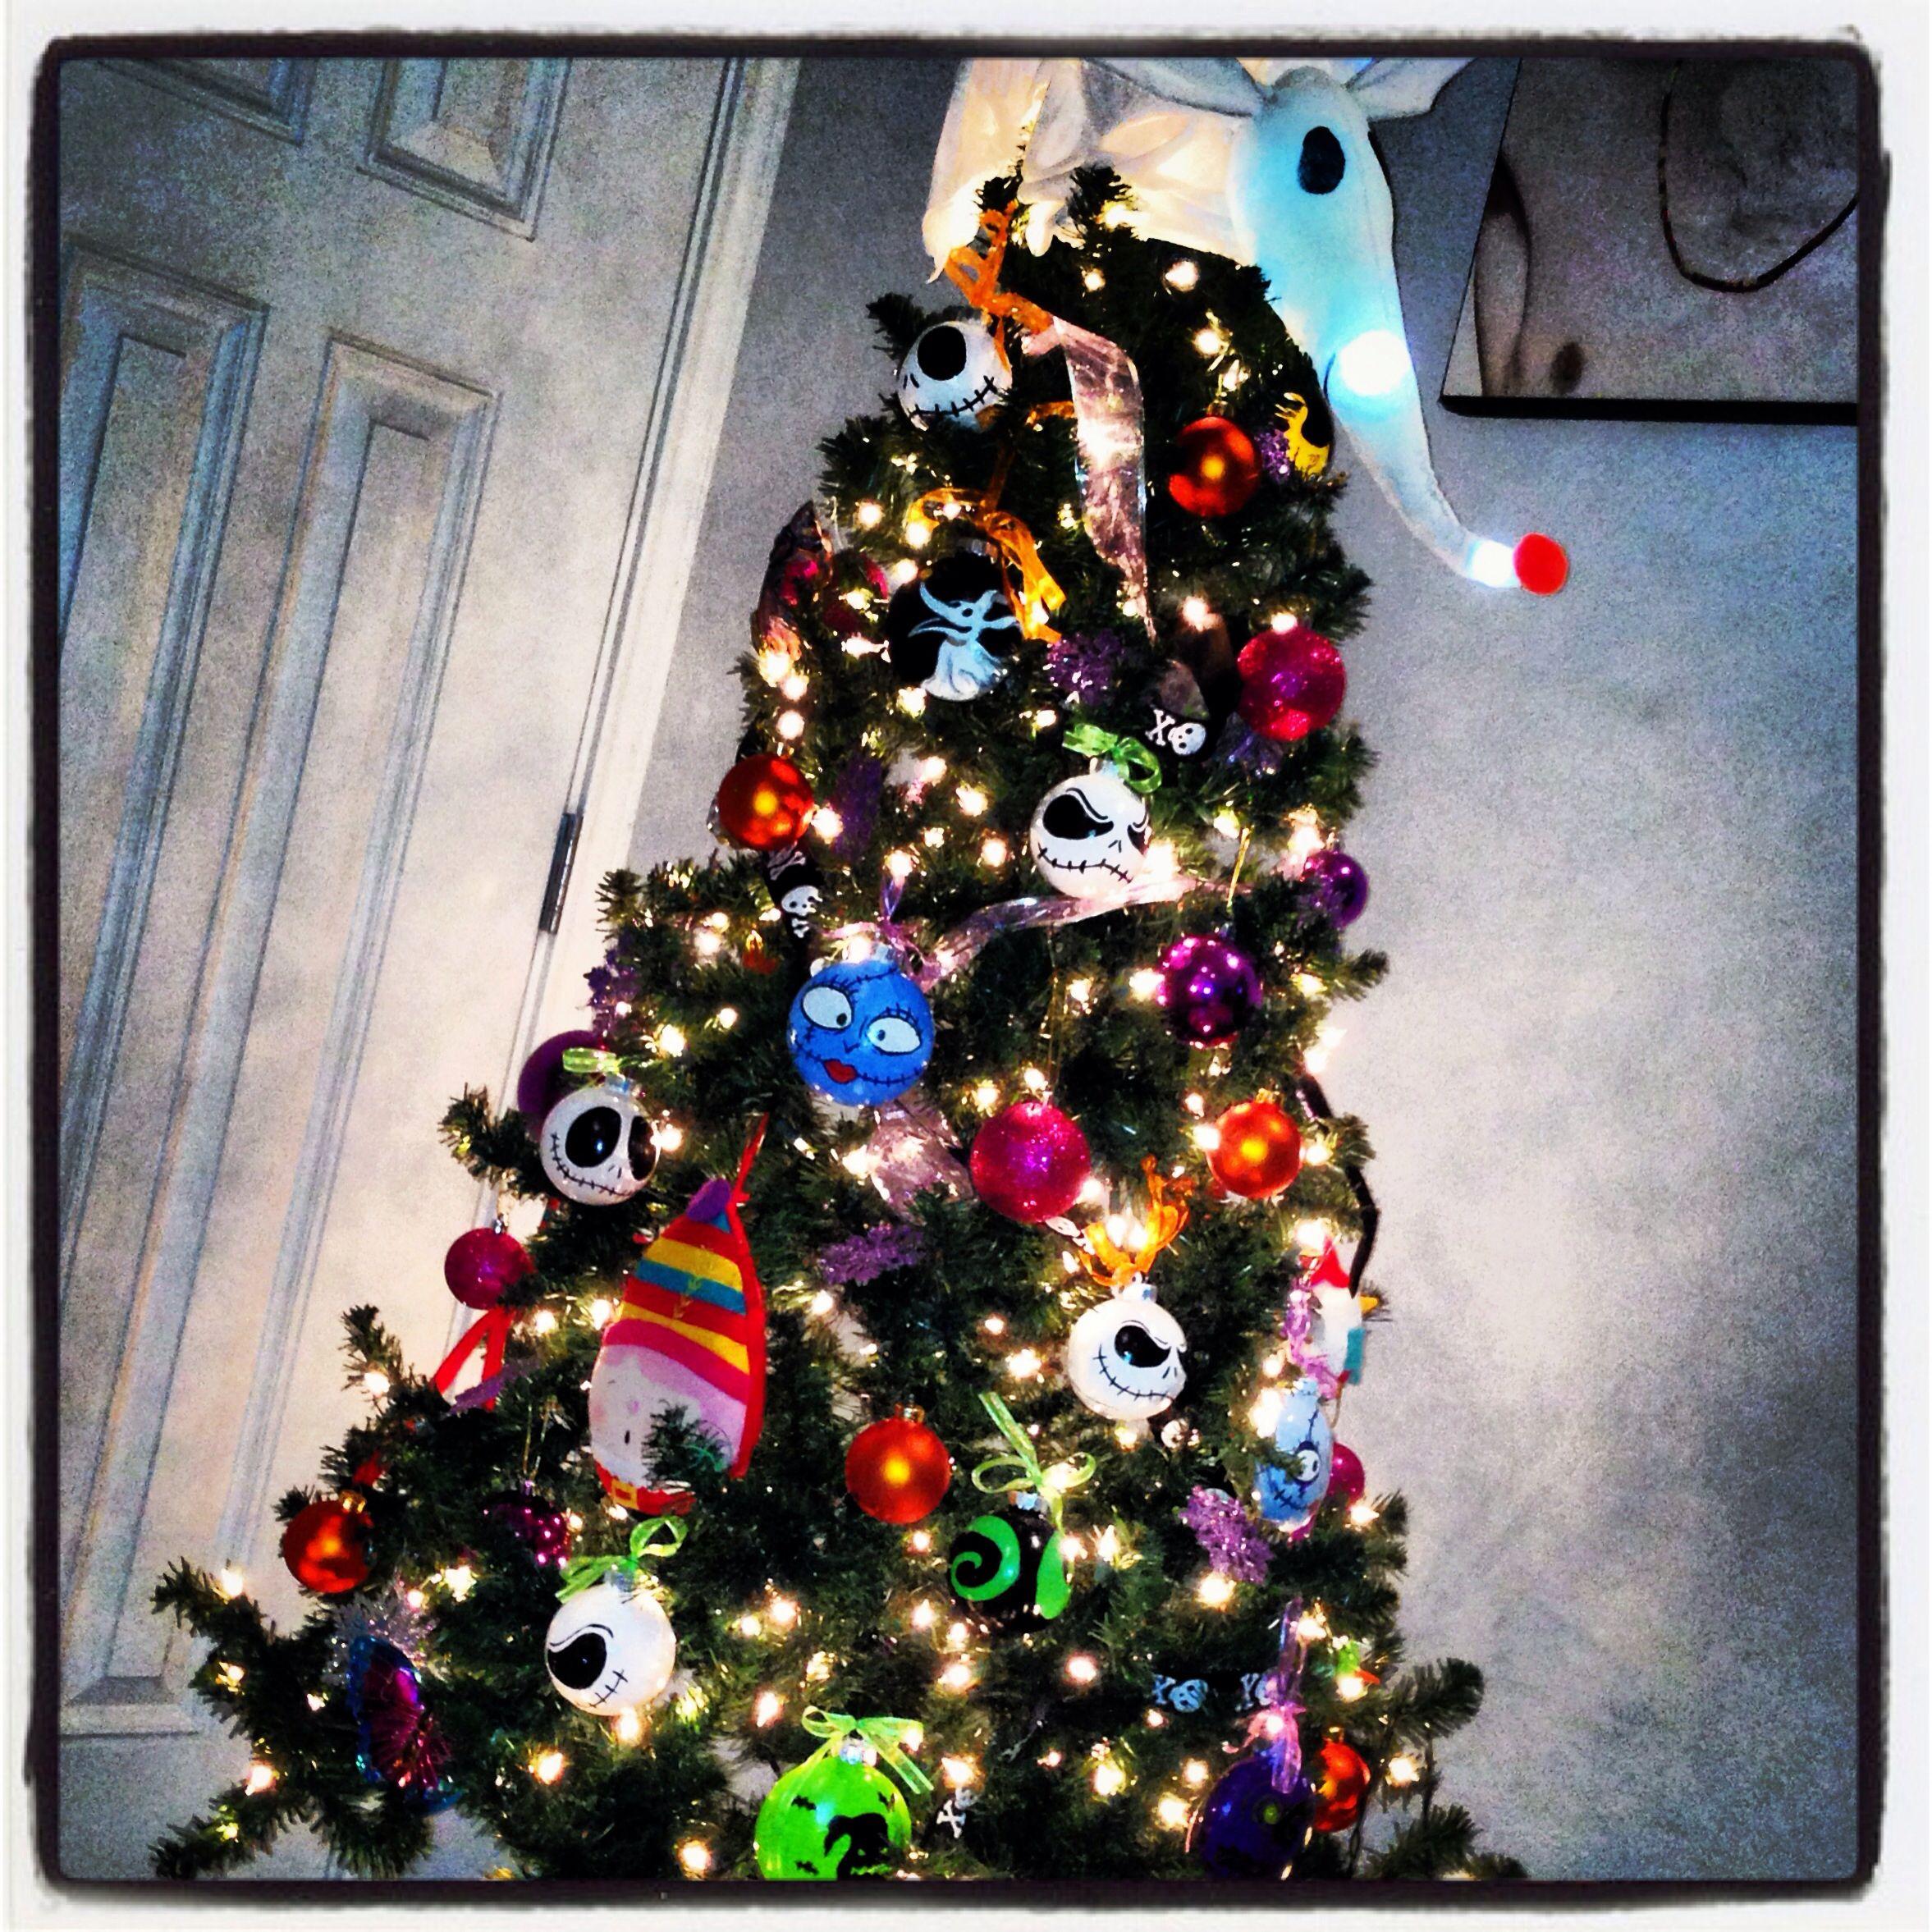 Nightmare before christmas tree with handmade ornaments | Holidays ...